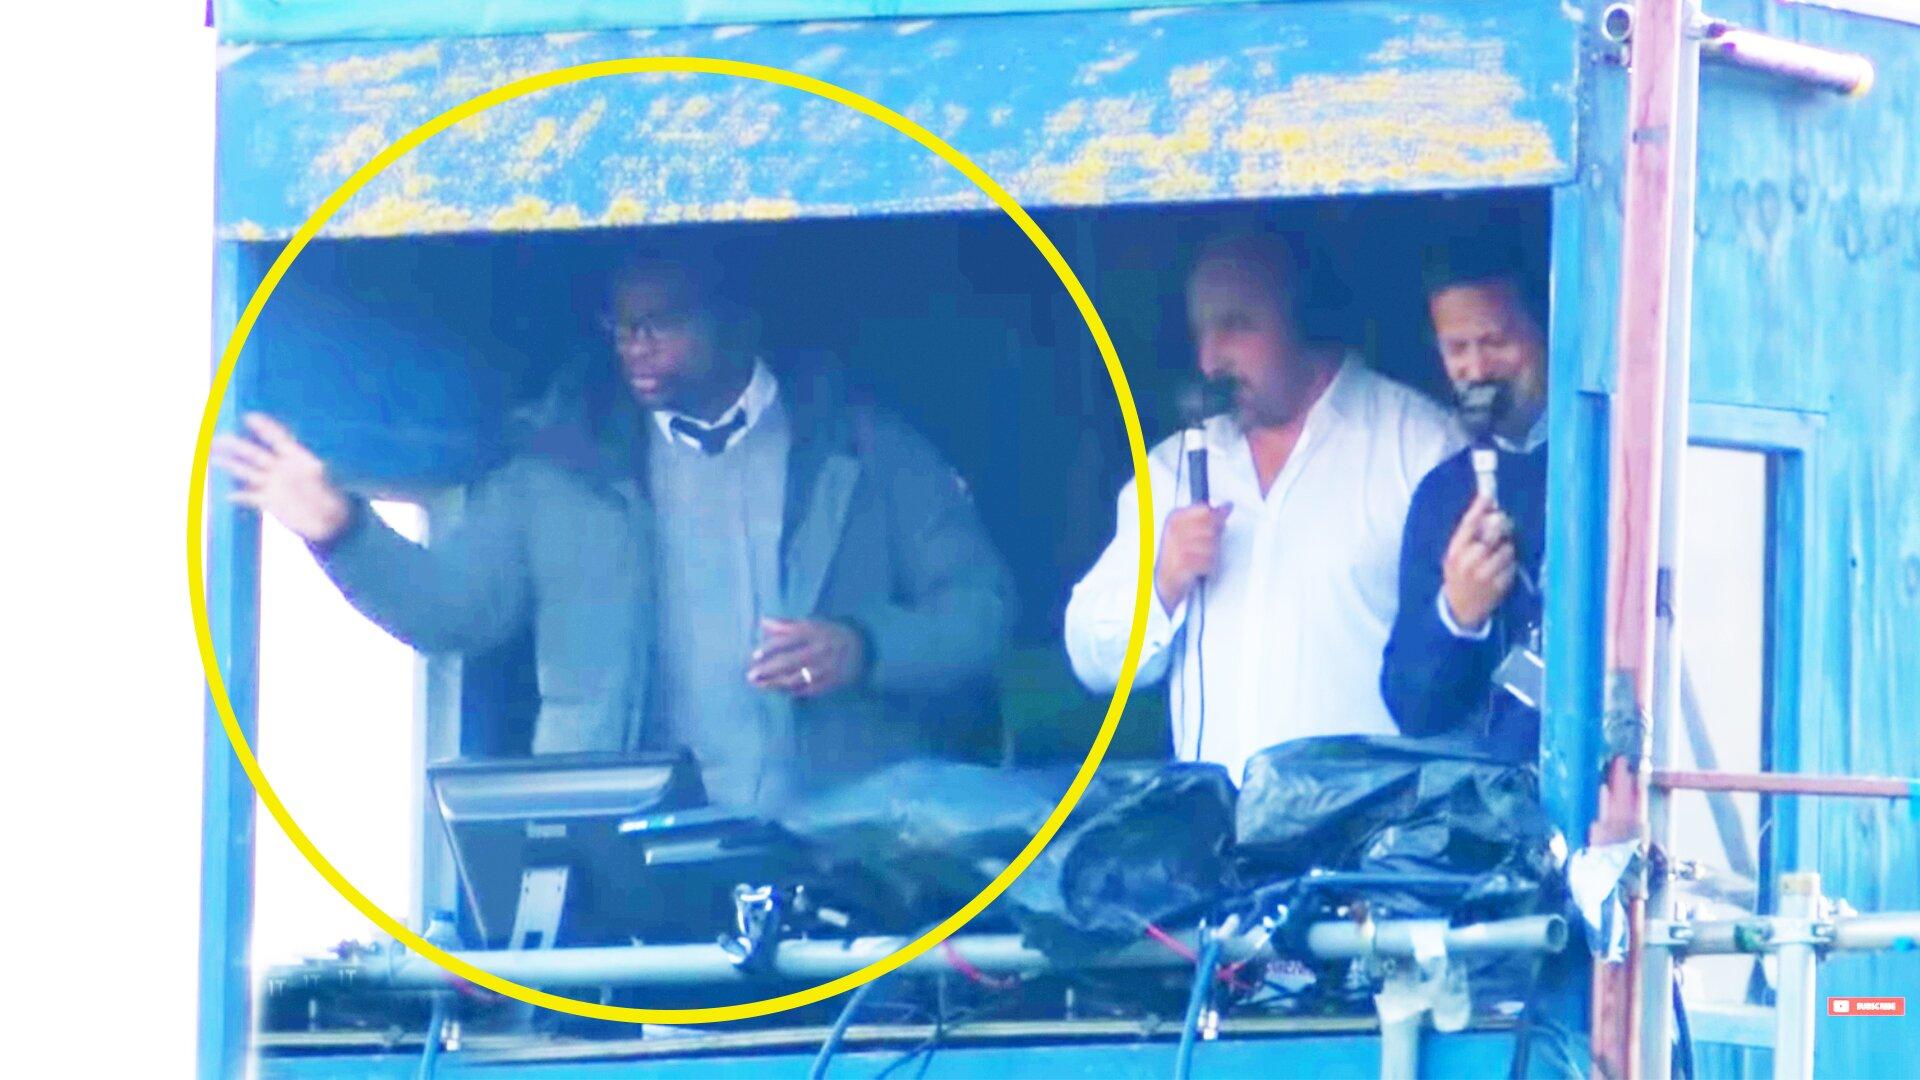 The day Ugo Monye shocked a Premiership crowd